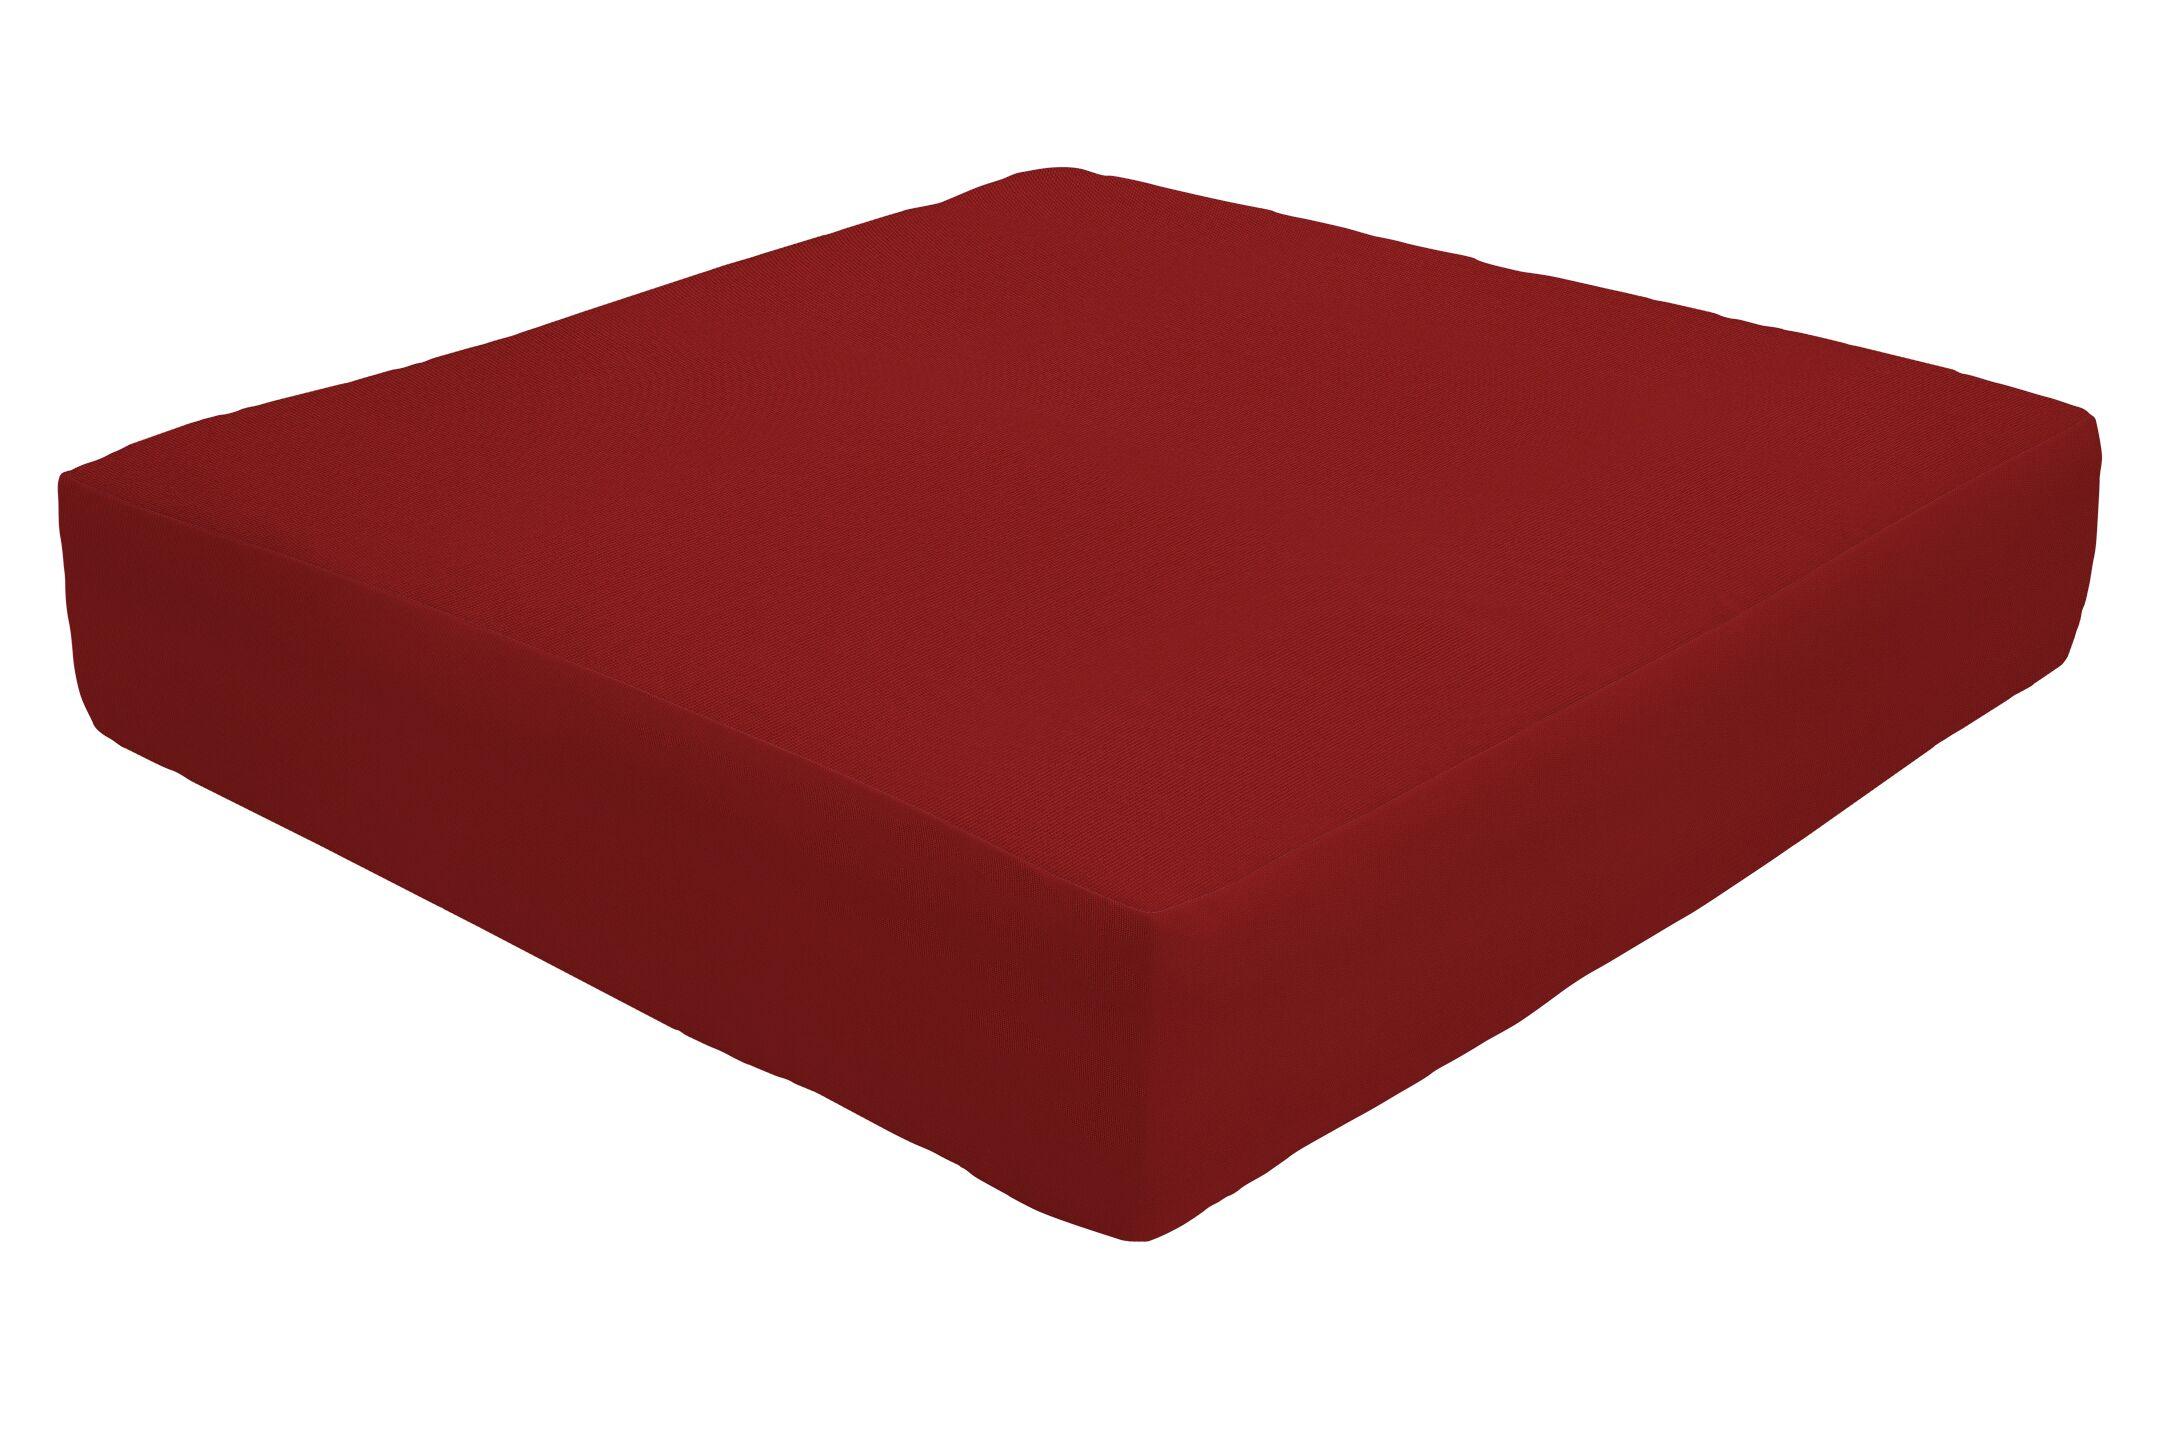 Double Piped Indoor/Outdoor Sunbrella Ottoman Cushion Fabric: Jockey Red, Size: 5